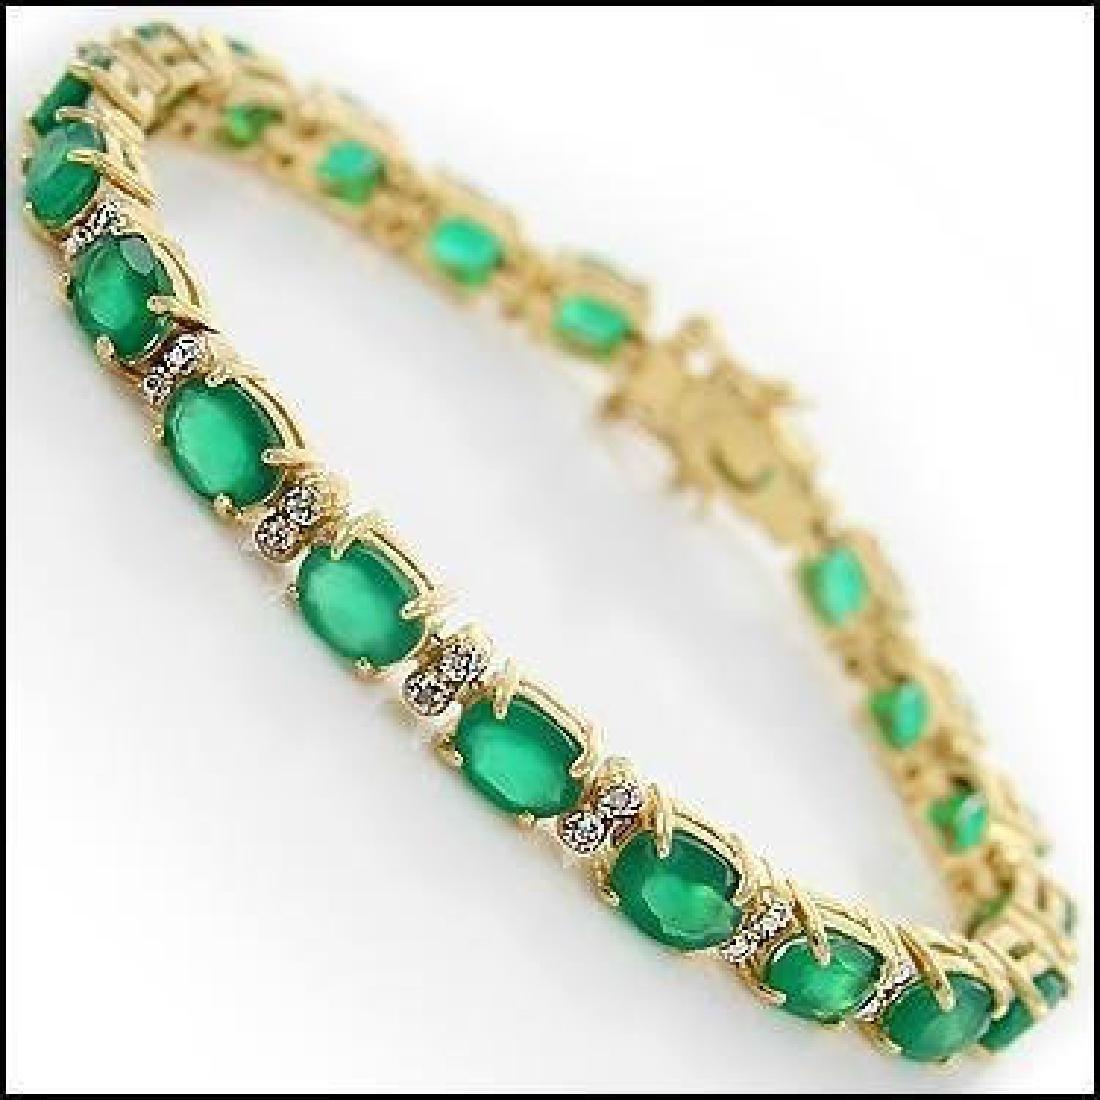 13 CT Green Agate Diamond Tennis Bracelet - 2